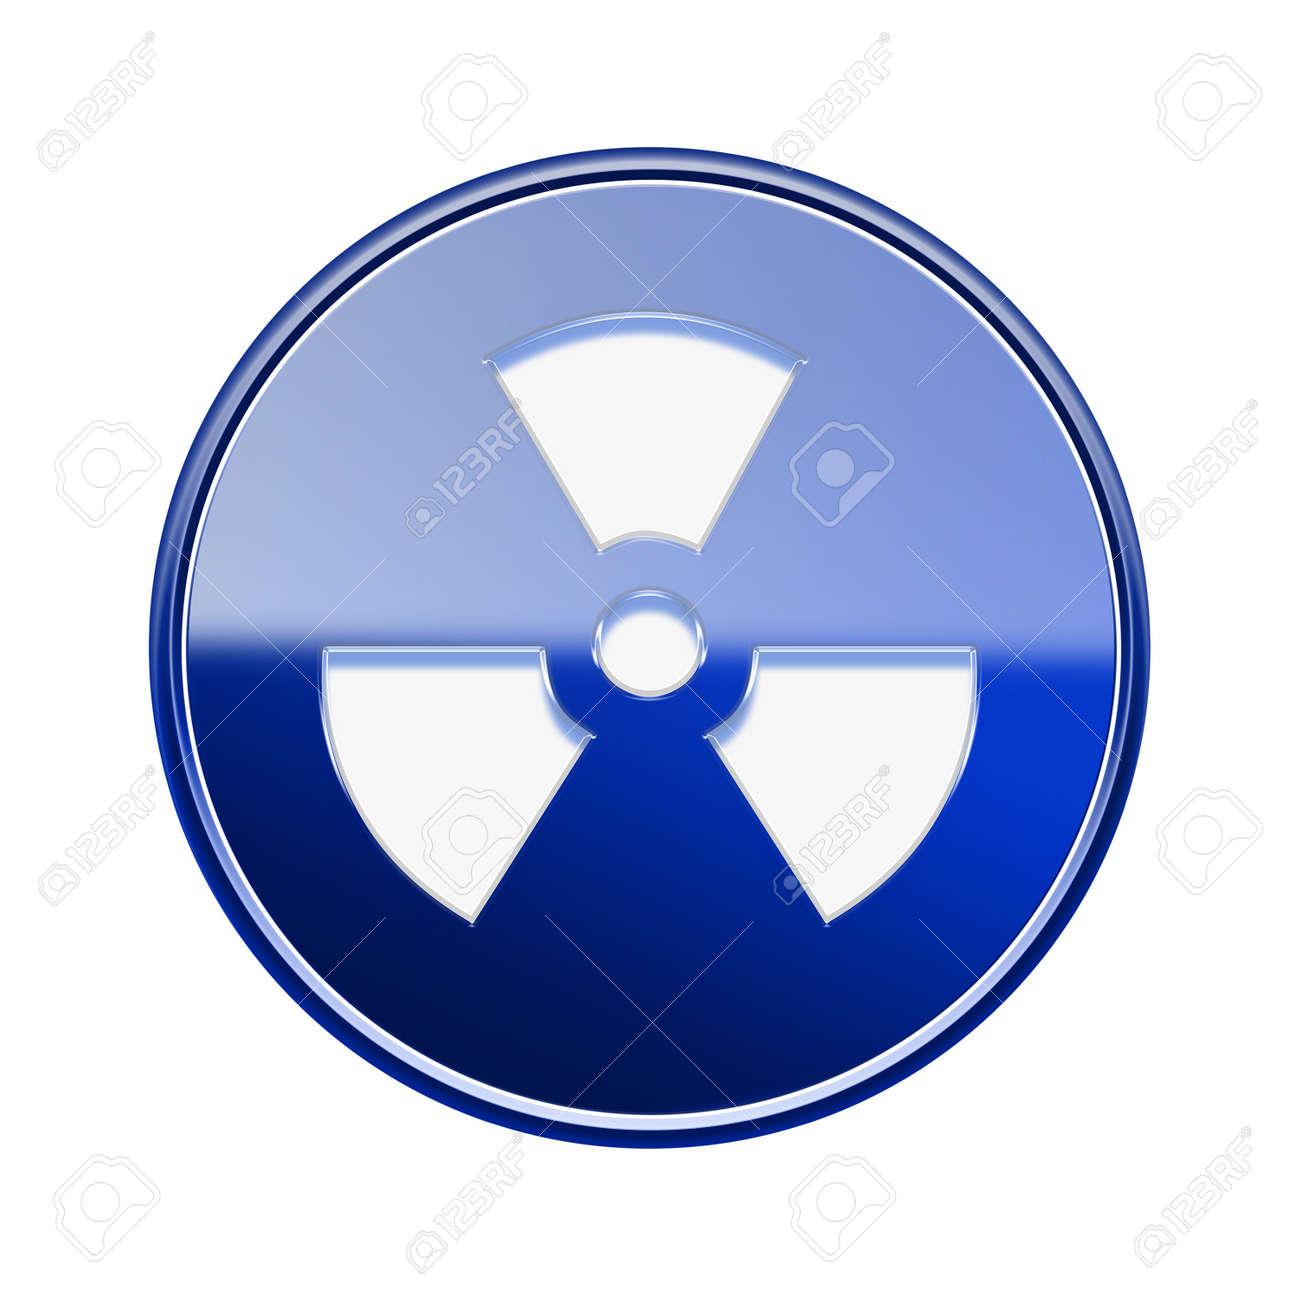 Radioactive icon glossy blue, isolated on white background. Stock Photo - 21452339